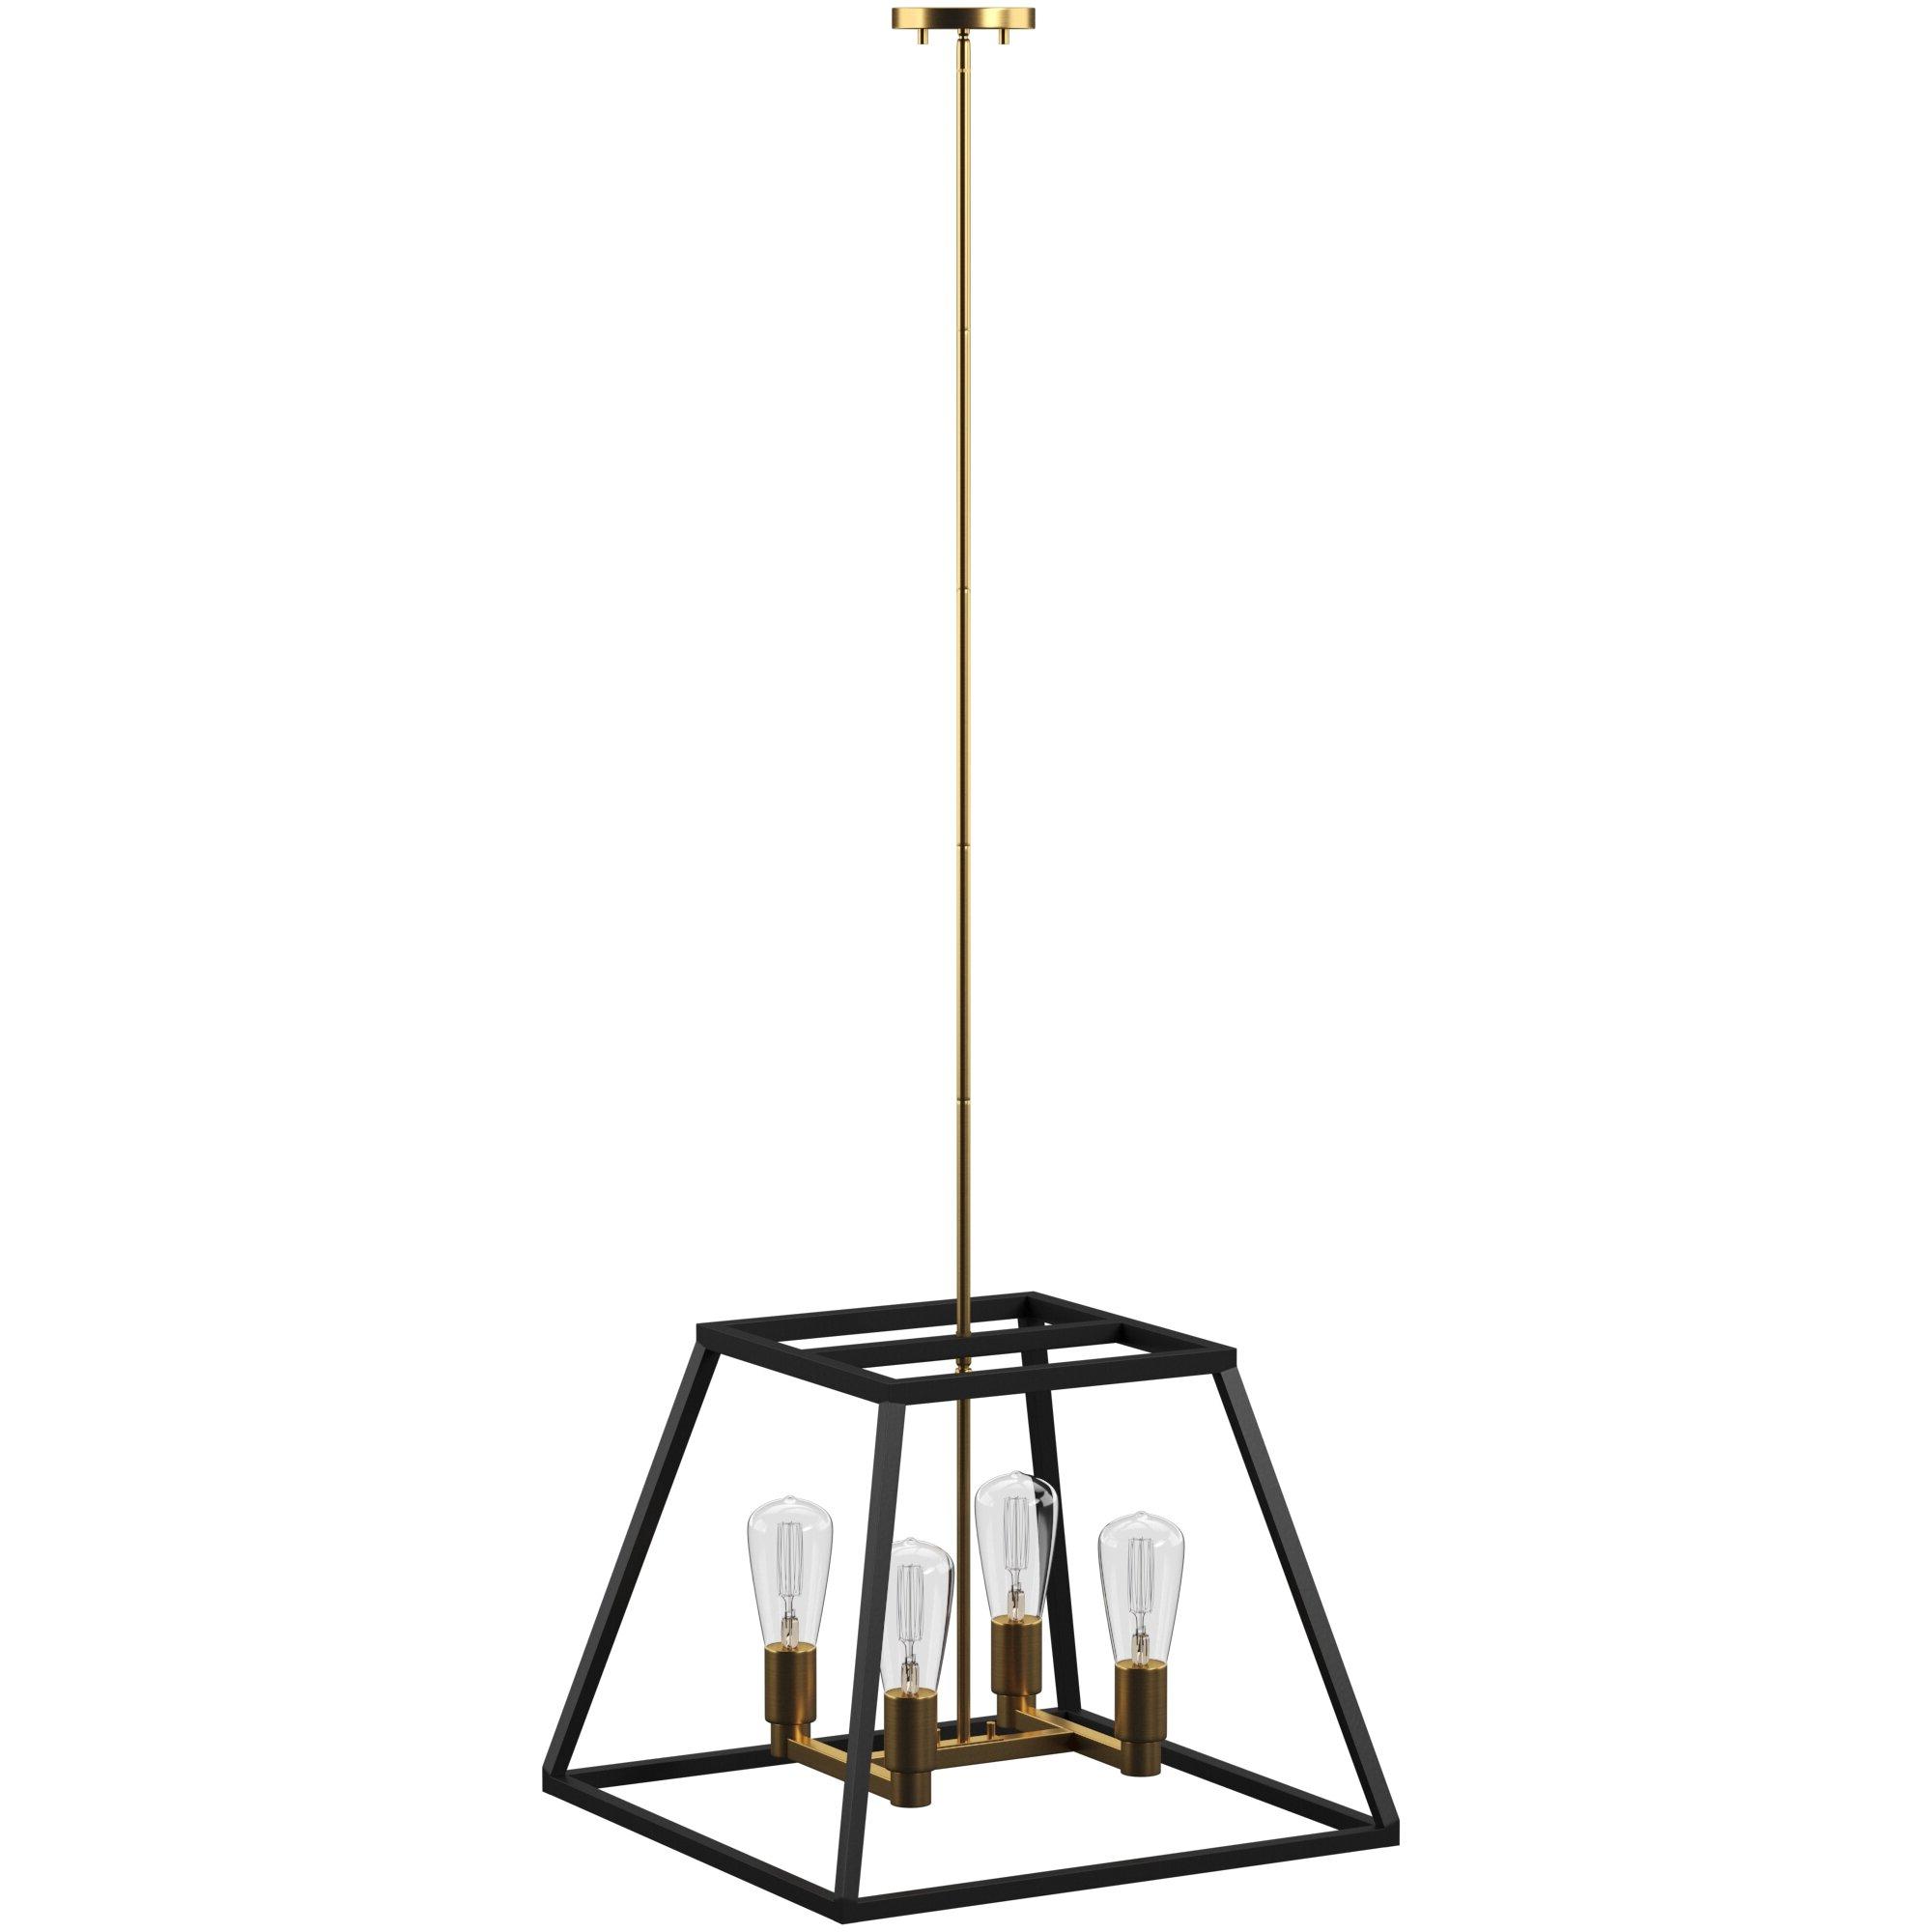 Well Liked Shisler 4 Light Square/rectangle Chandelier For Delon 4 Light Square Chandeliers (Gallery 6 of 20)